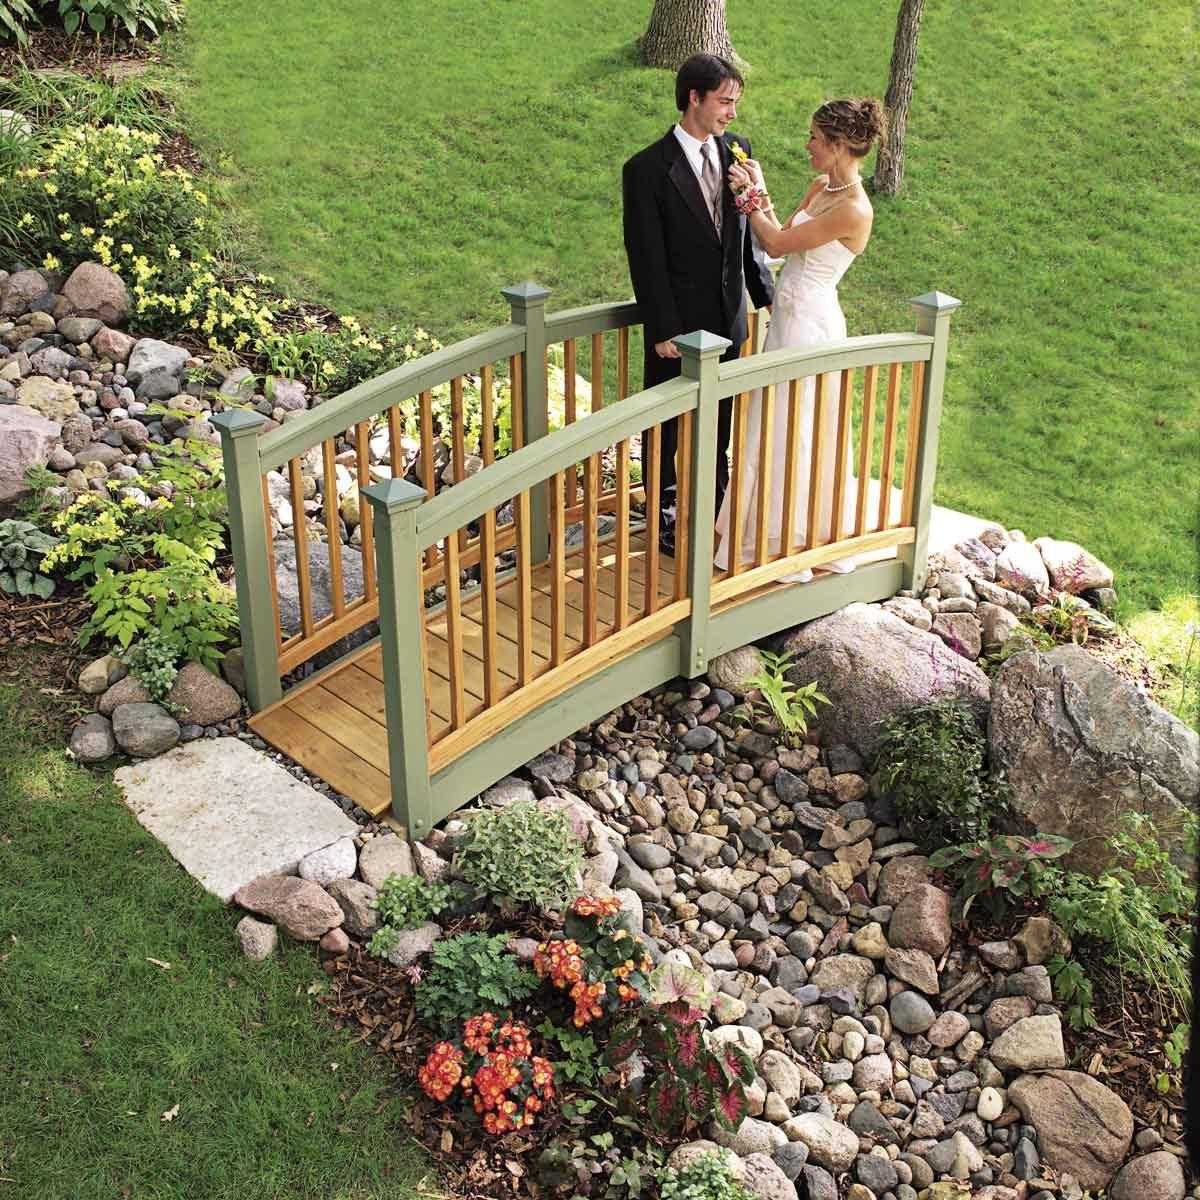 How to Build a Garden Bridge with an Arch?